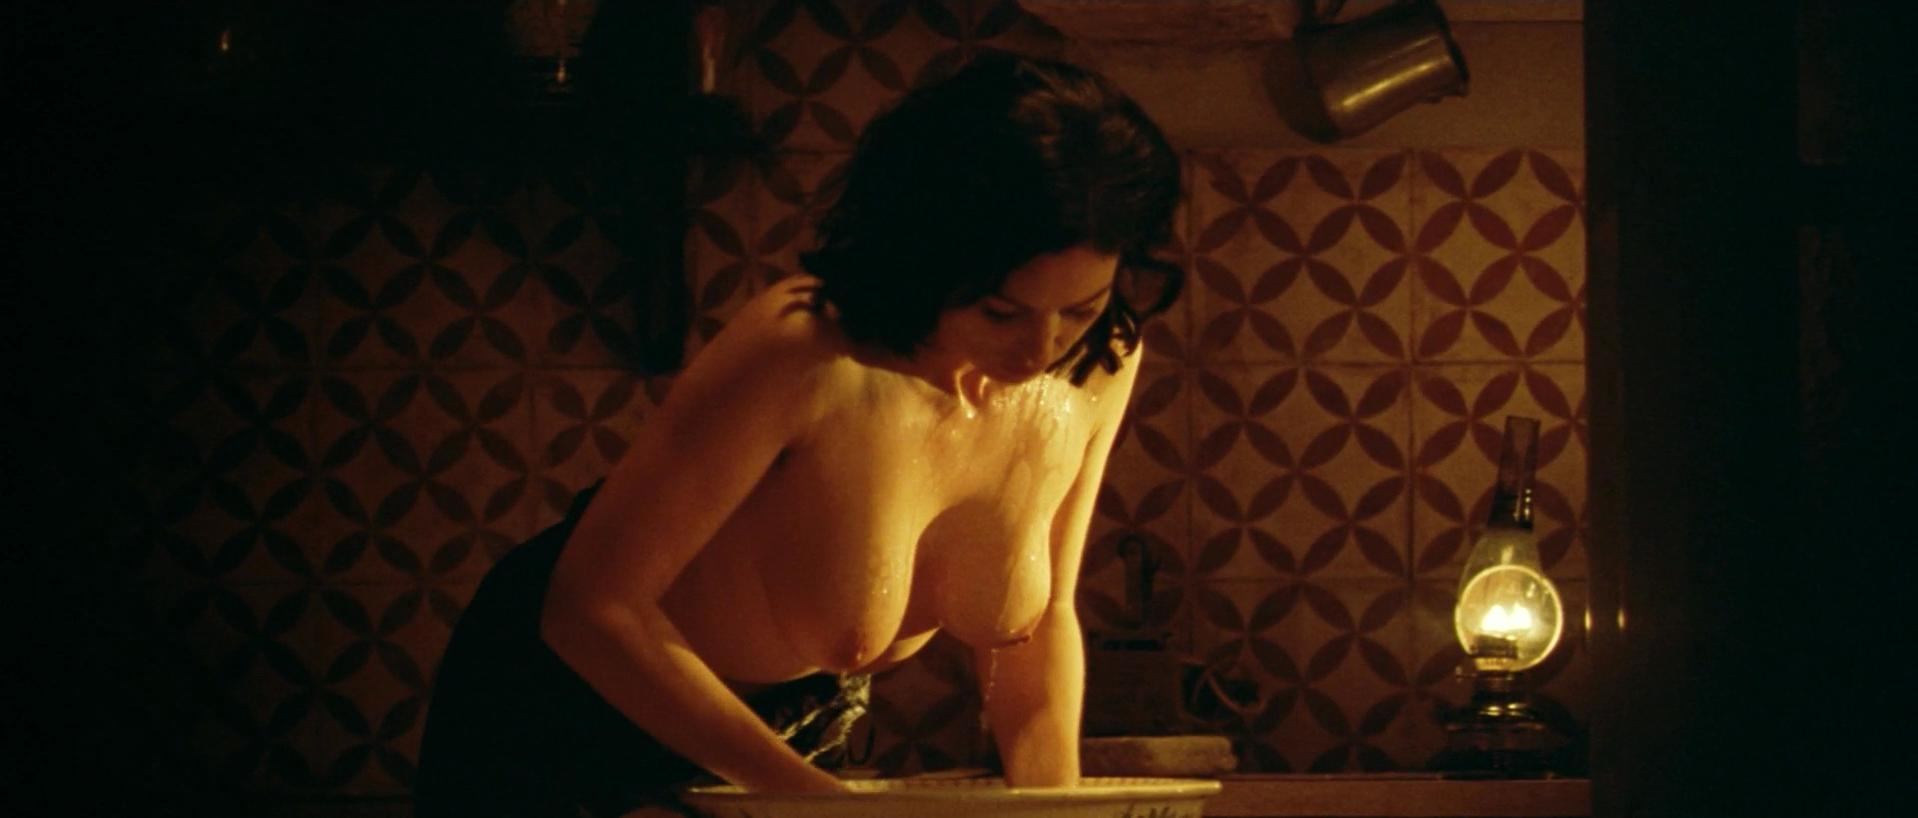 Priya mani naked photo